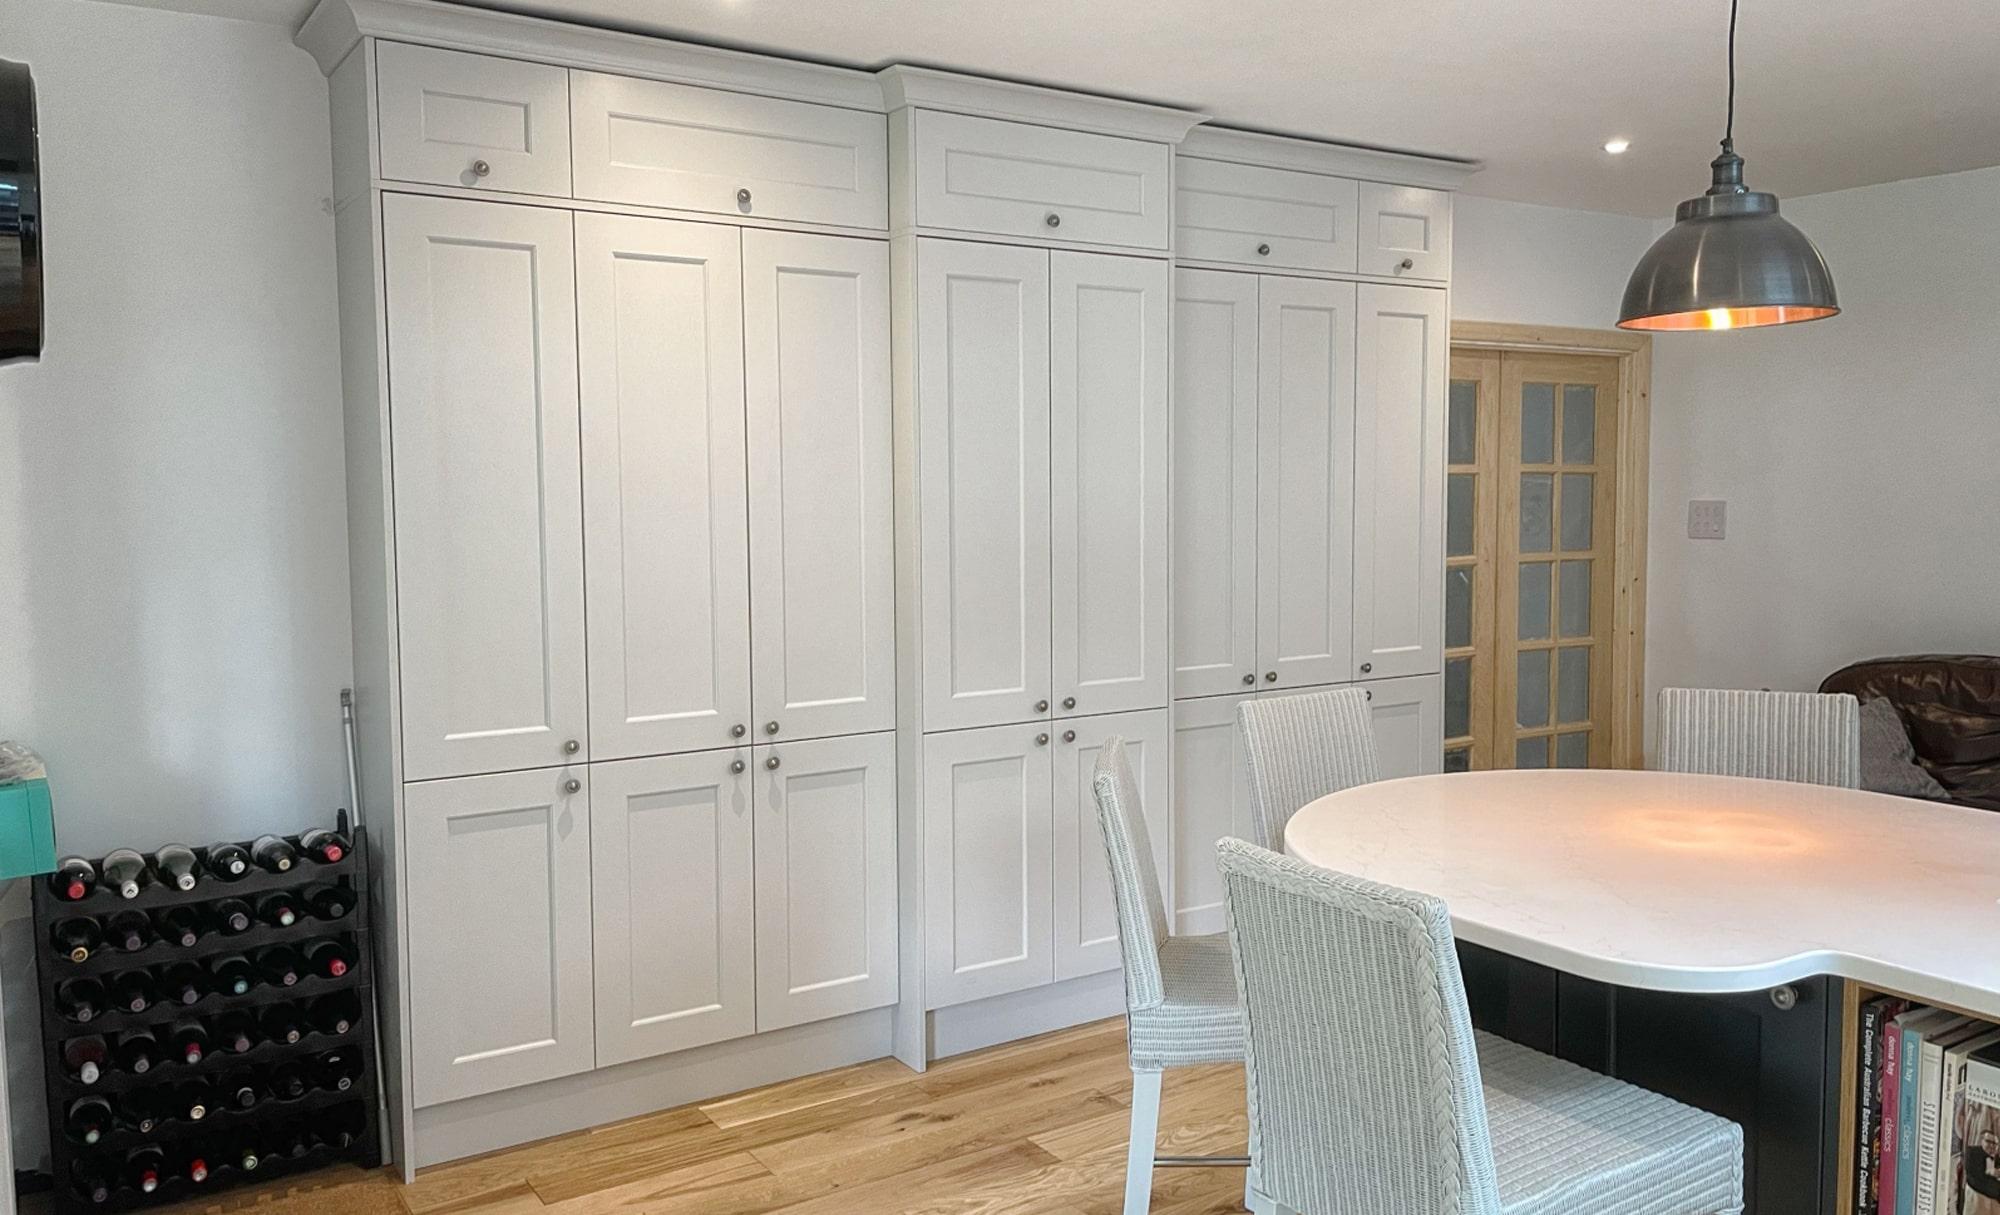 Kitchen Stori Wakefield Graphite and Light Grey Tall Doors